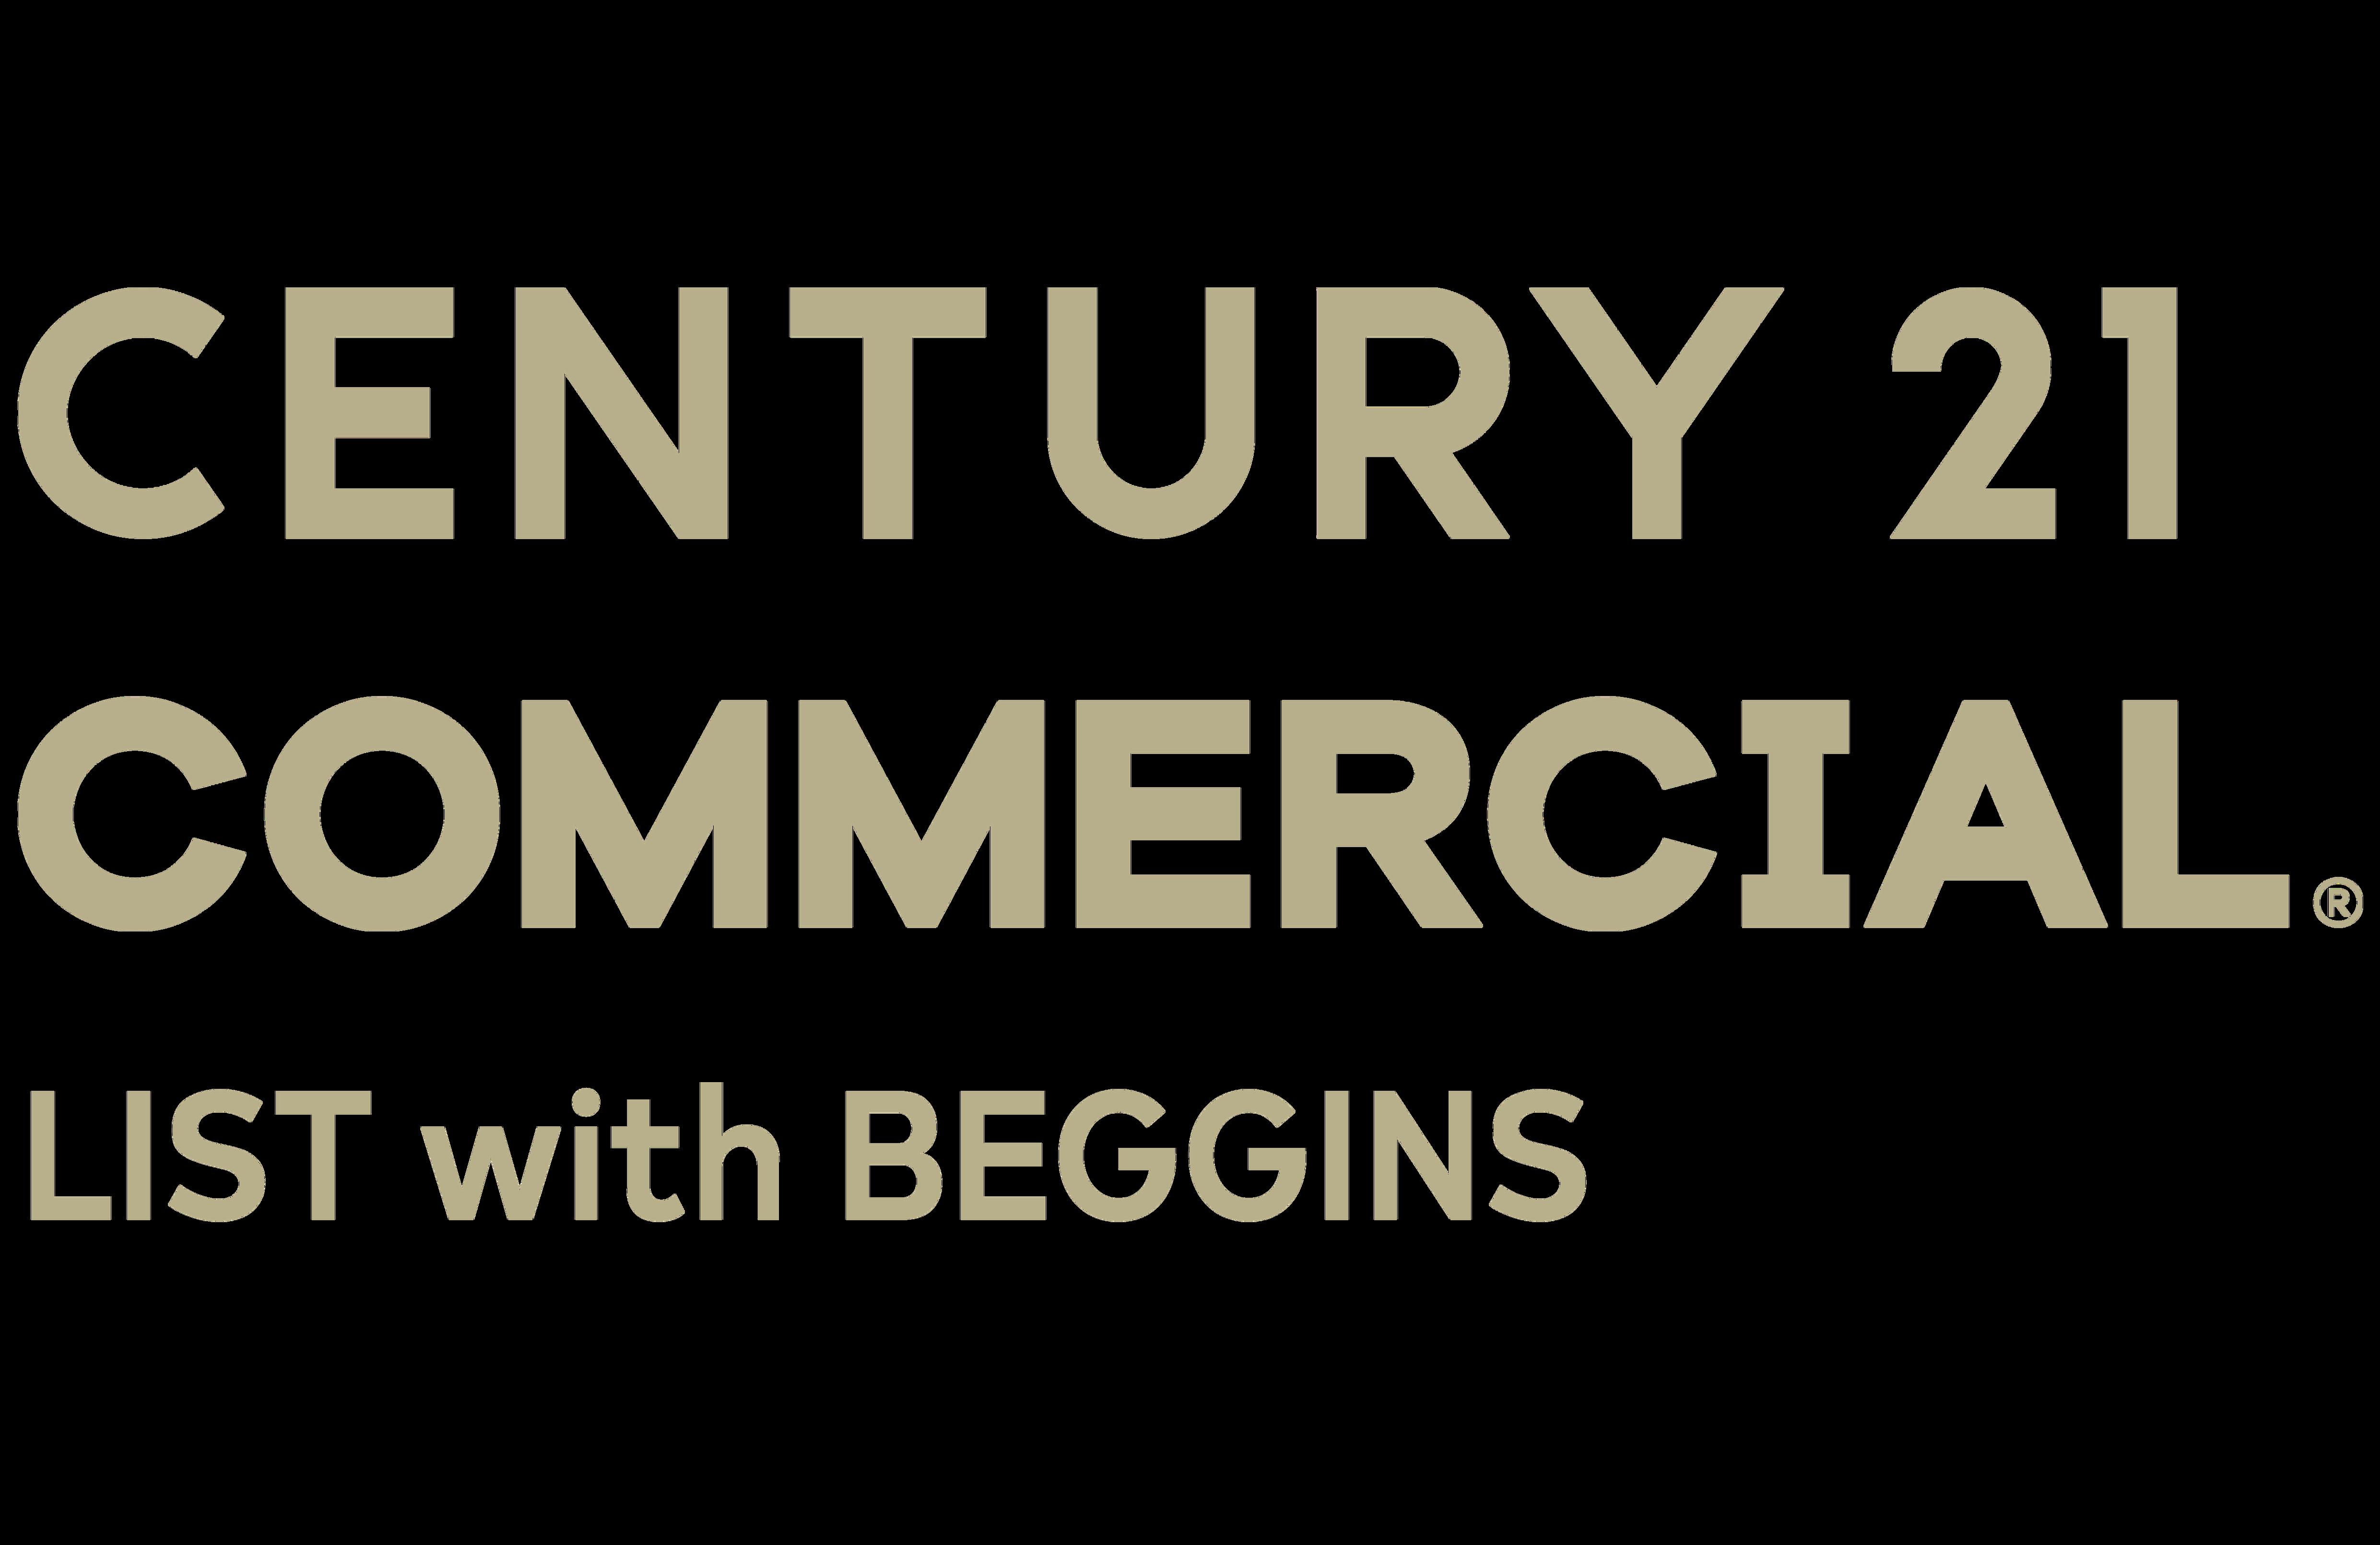 CENTURY 21 LIST with BEGGINS